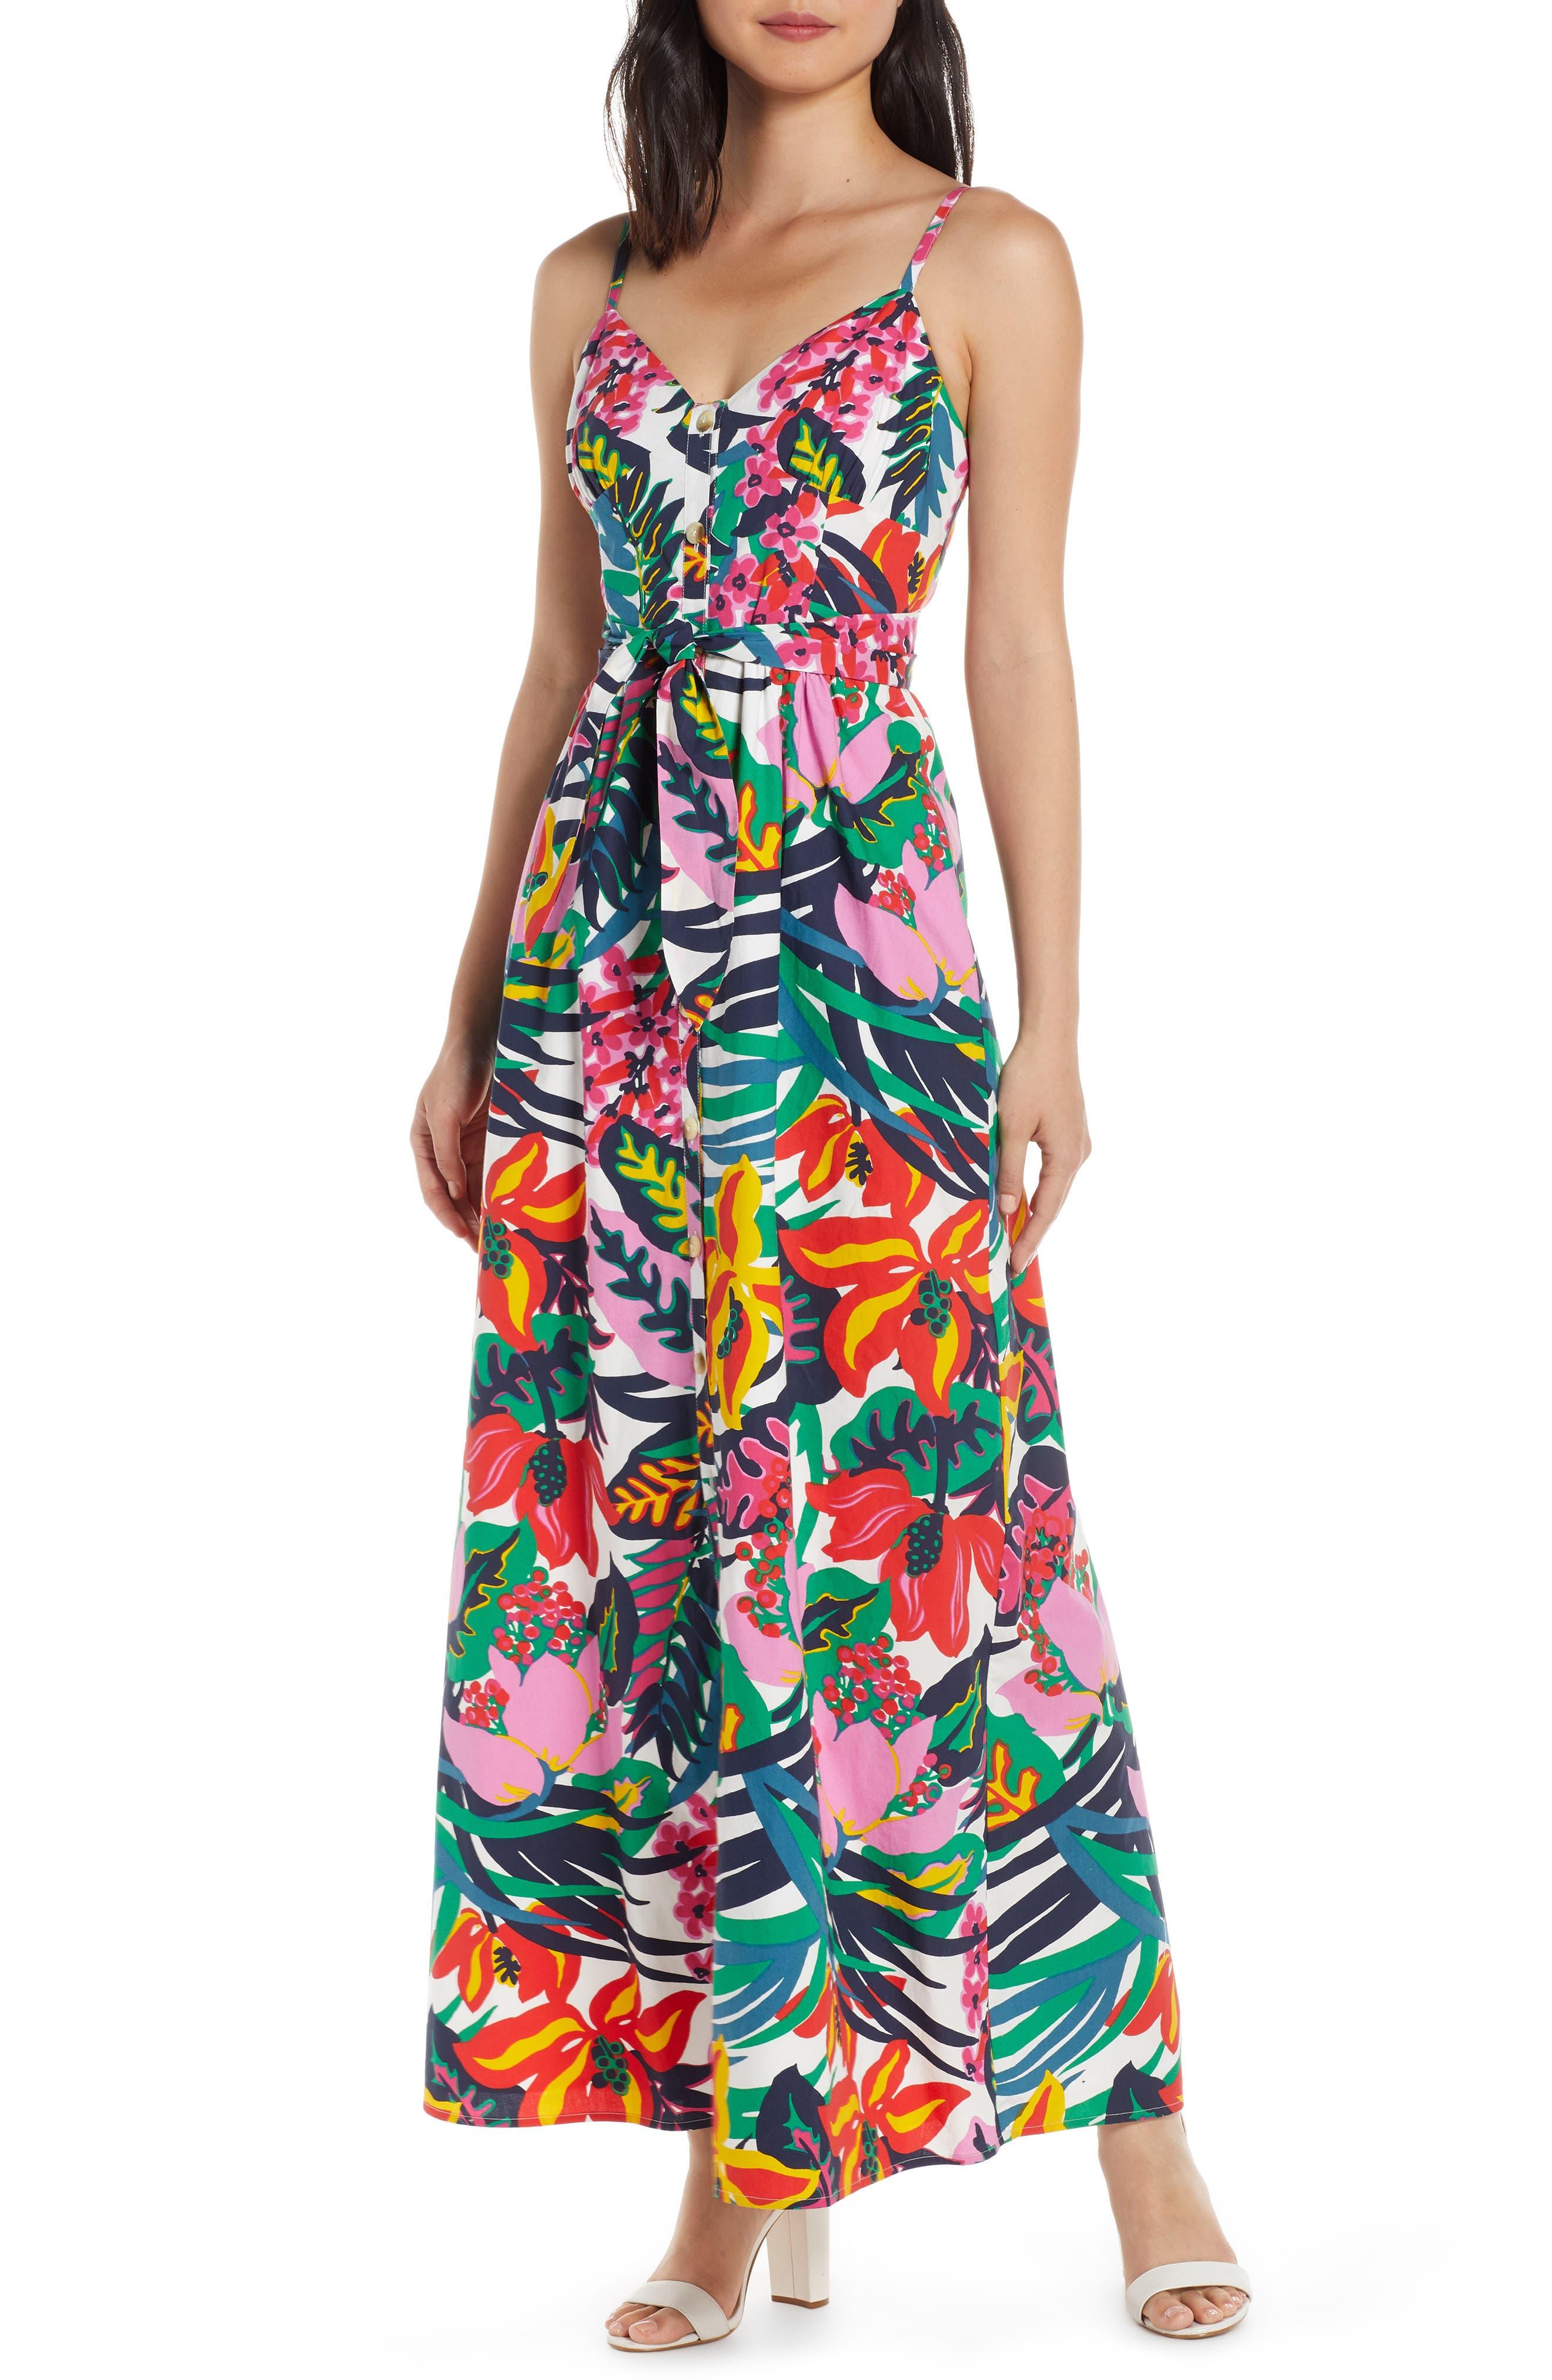 J.crew Floral Spaghetti Strap Maxi Dress, Ivory